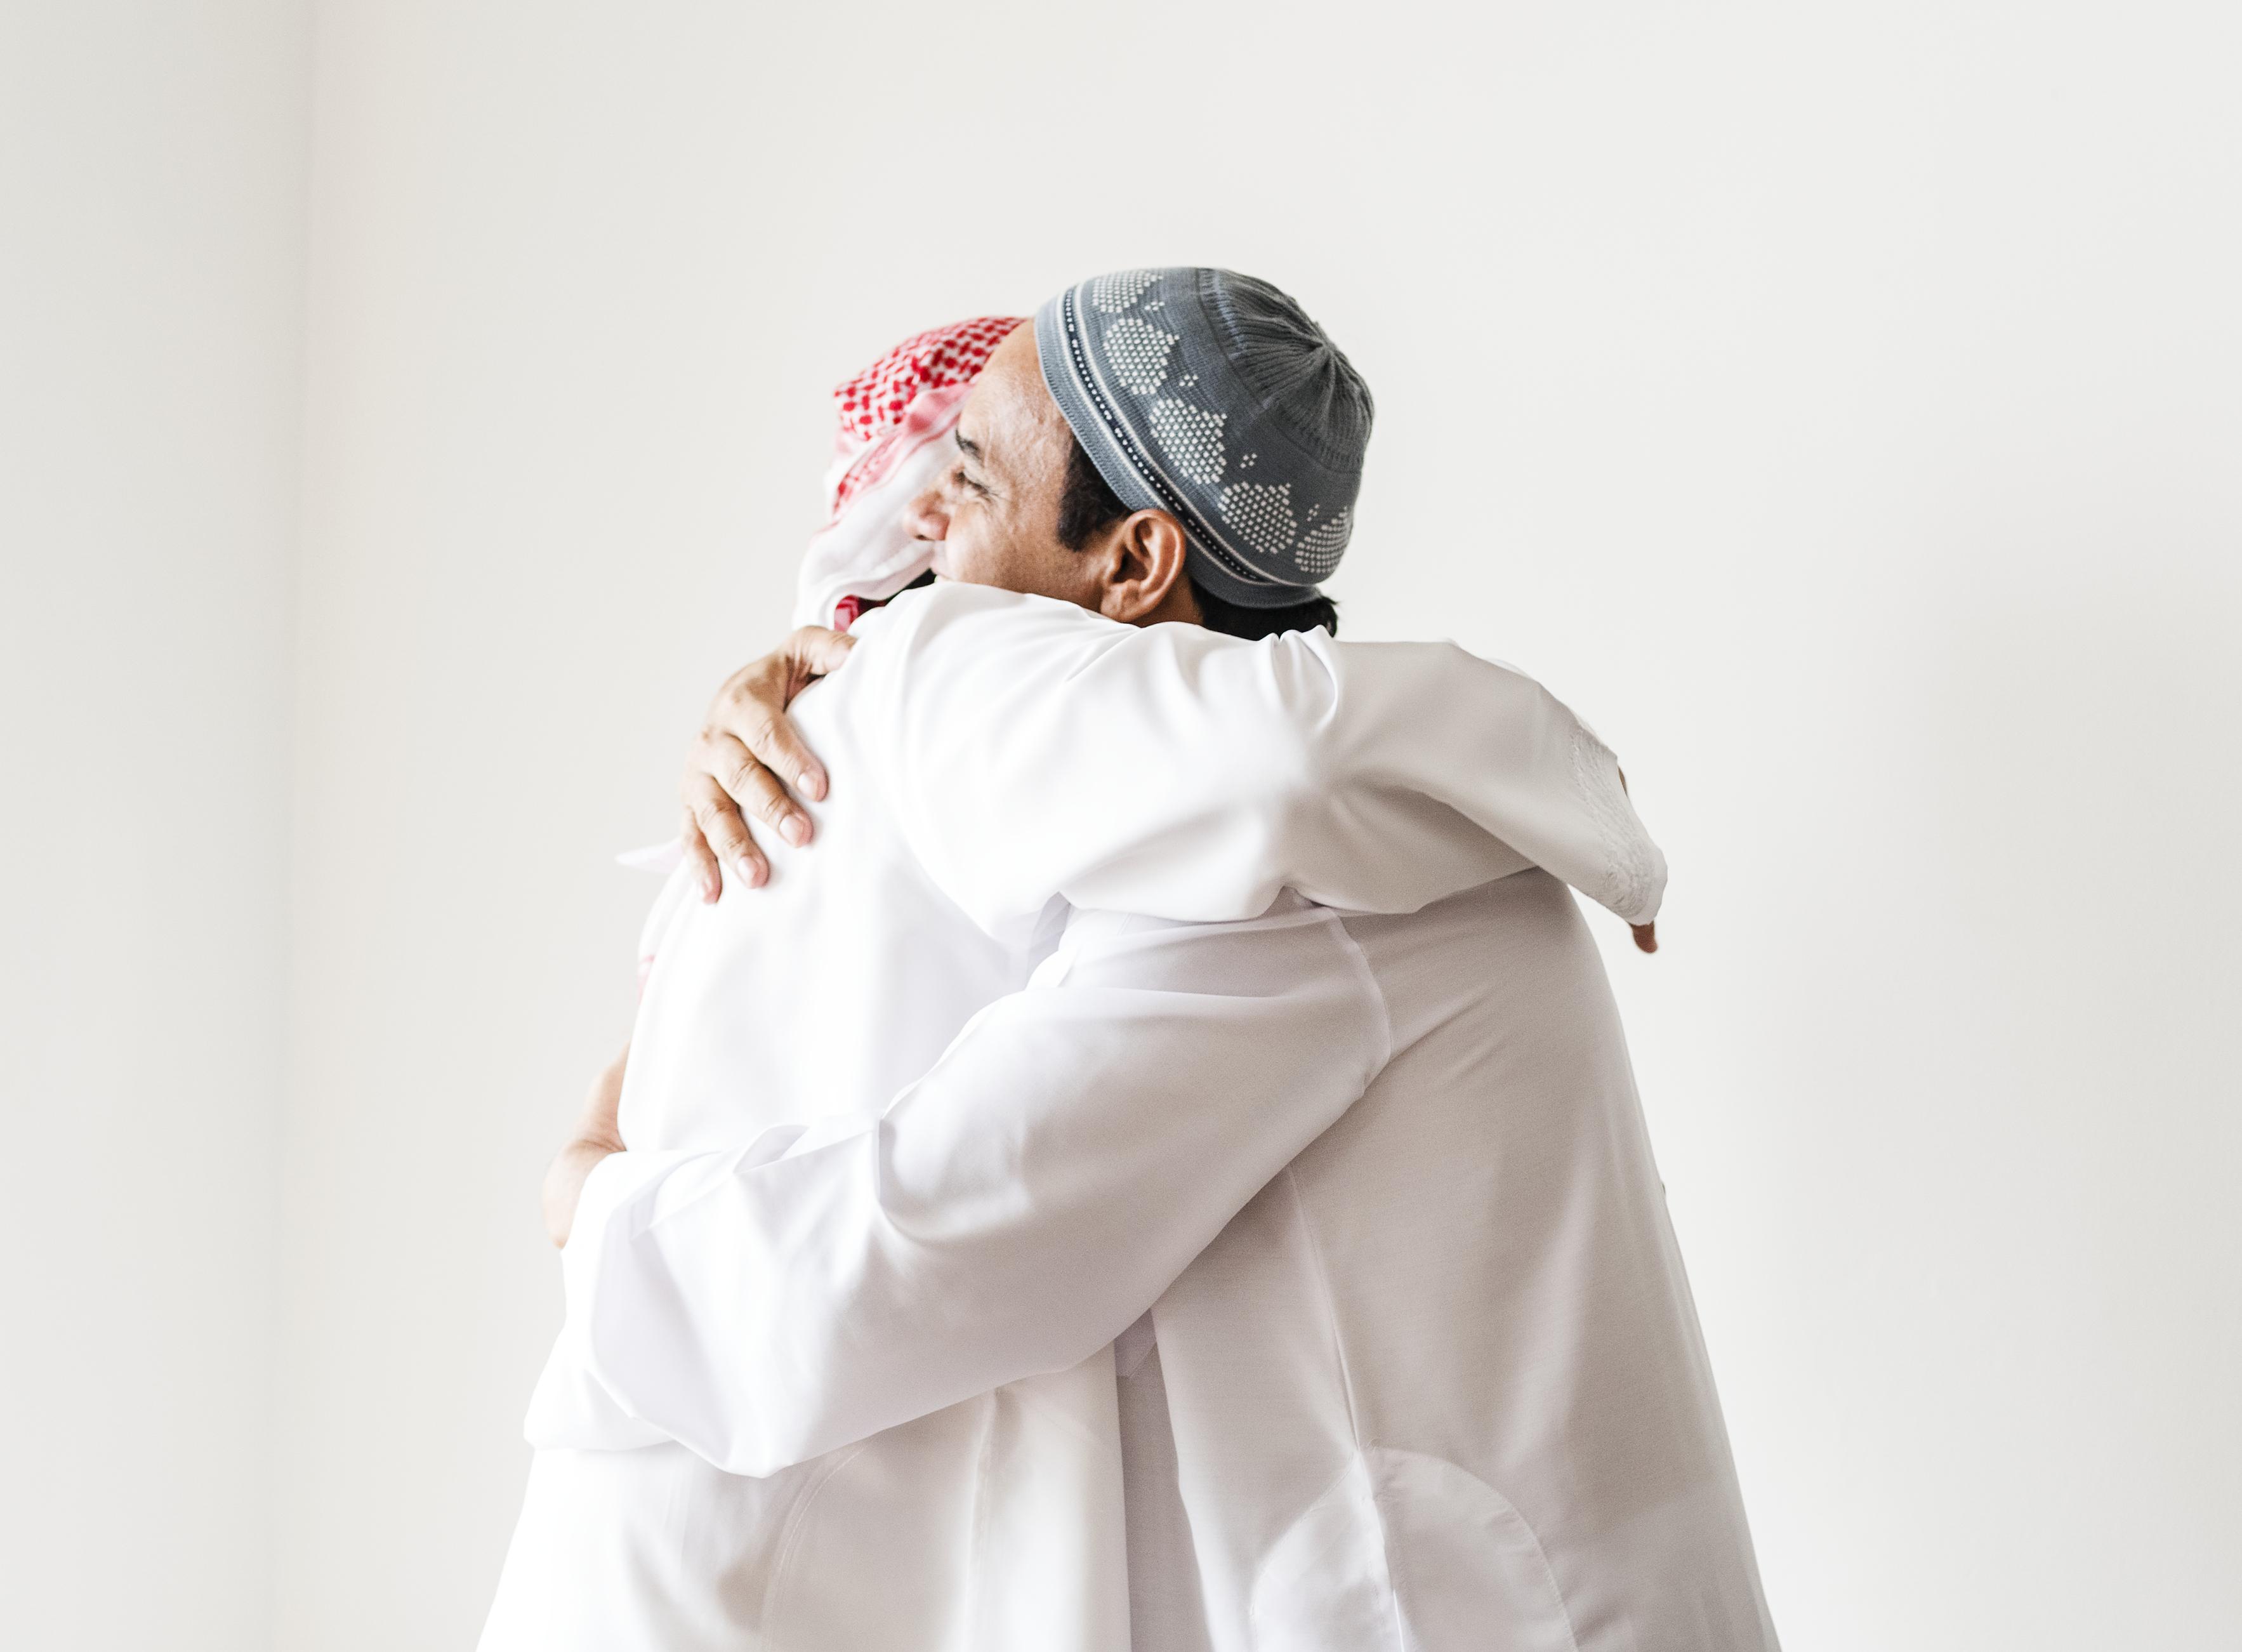 Muslim men hugging each other